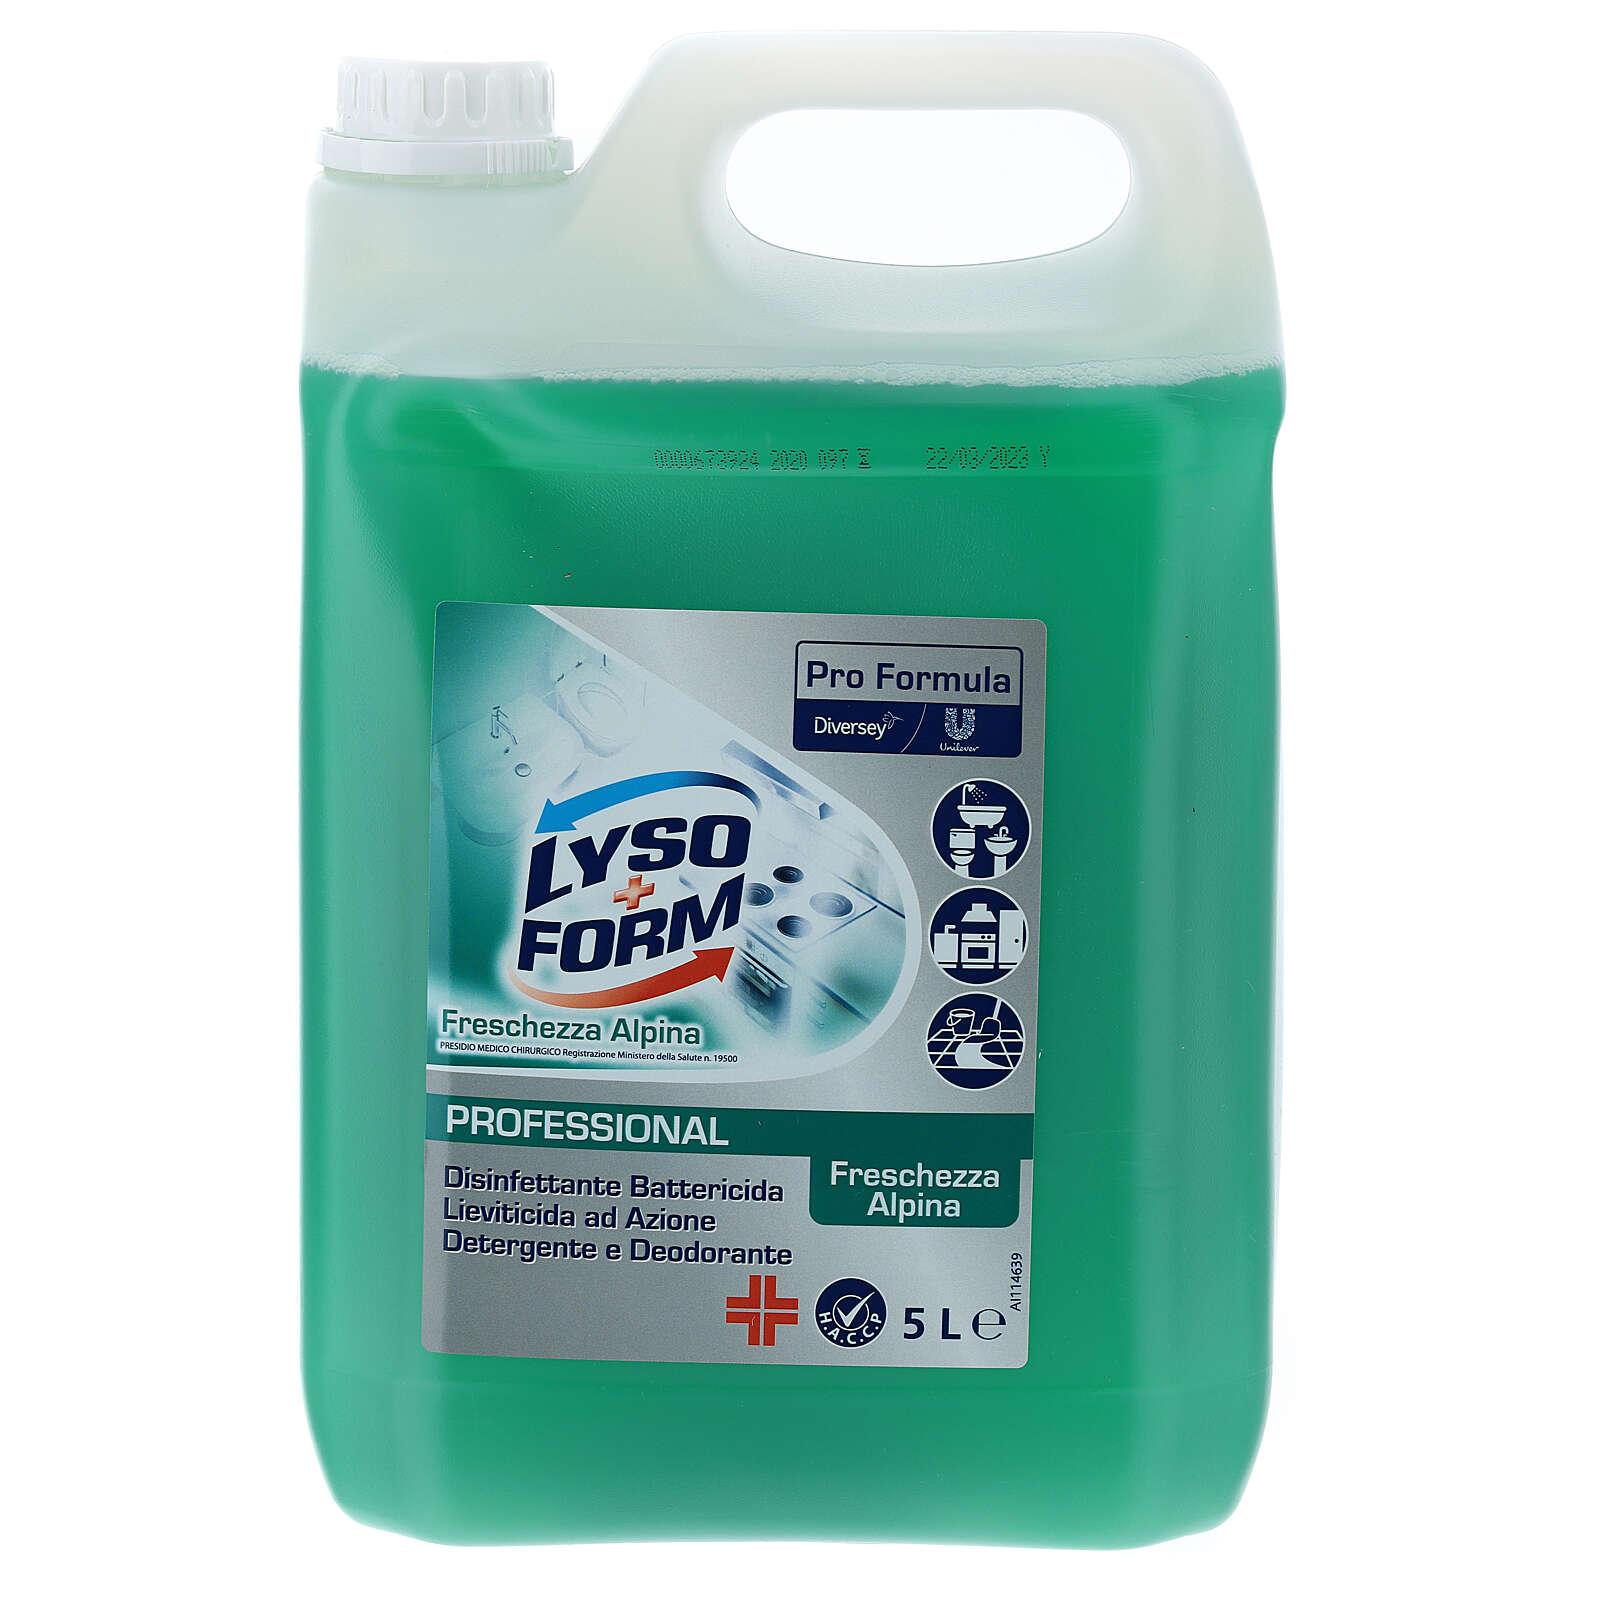 Tanque detergente Pro Formula Lysoform 5 litros 3